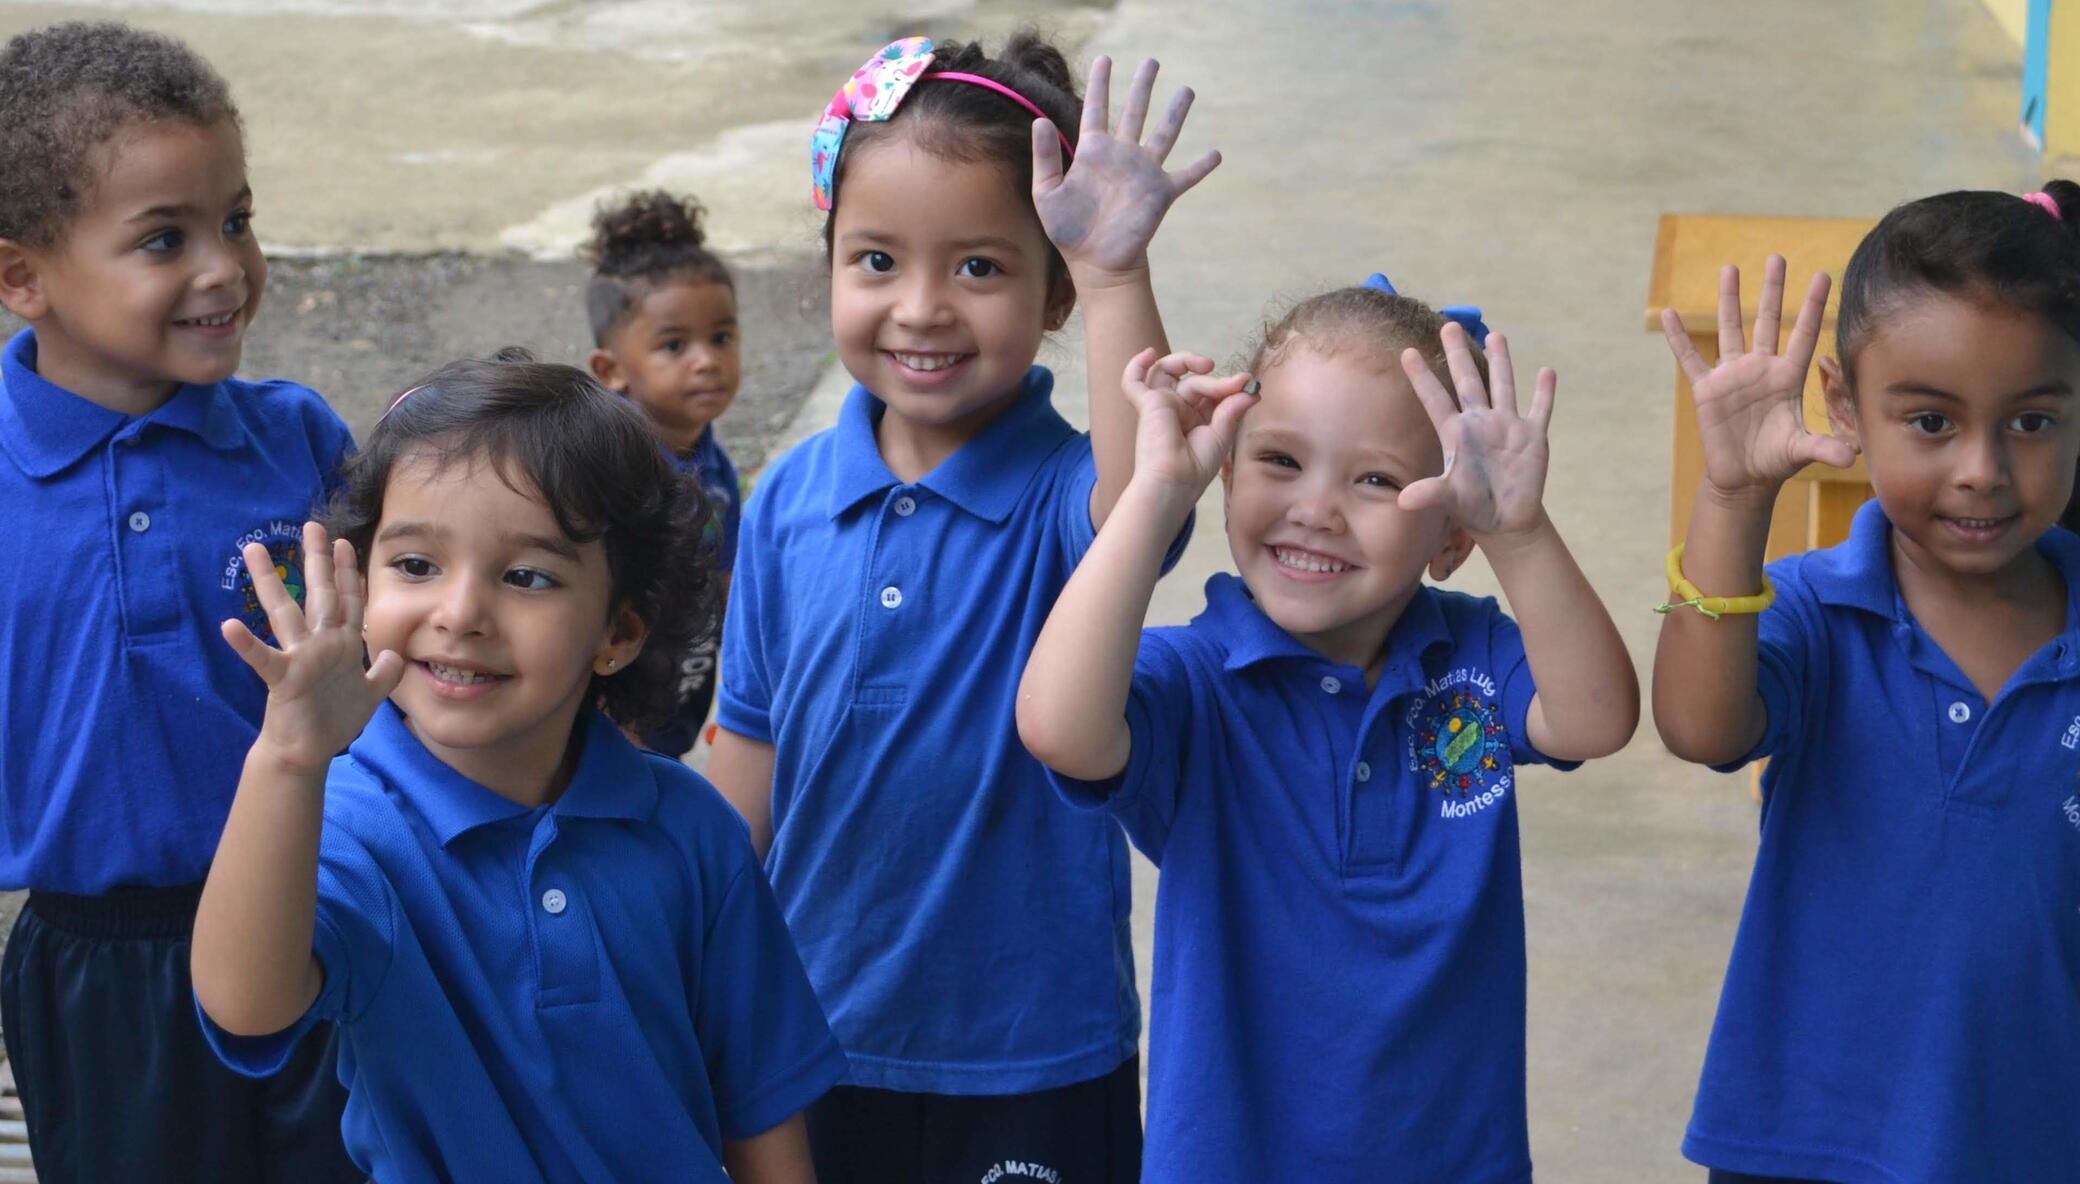 Support Montessori public education in Puerto Rico